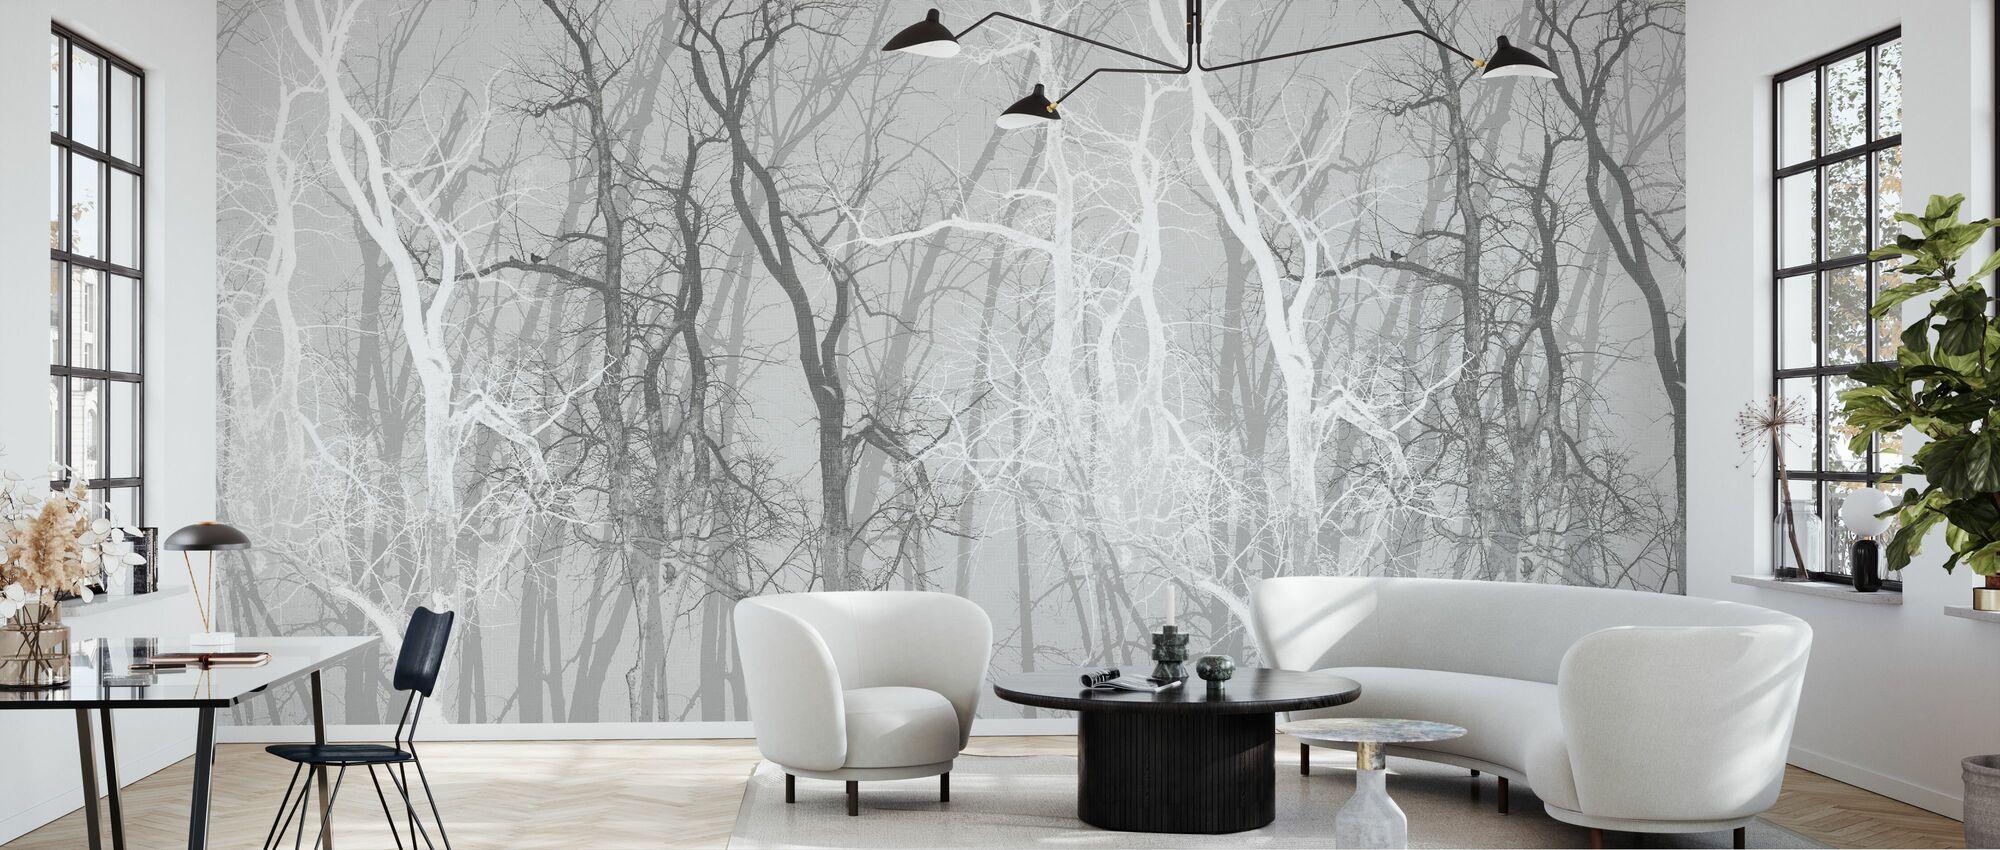 Wander Trees Charcoal - Wallpaper - Living Room